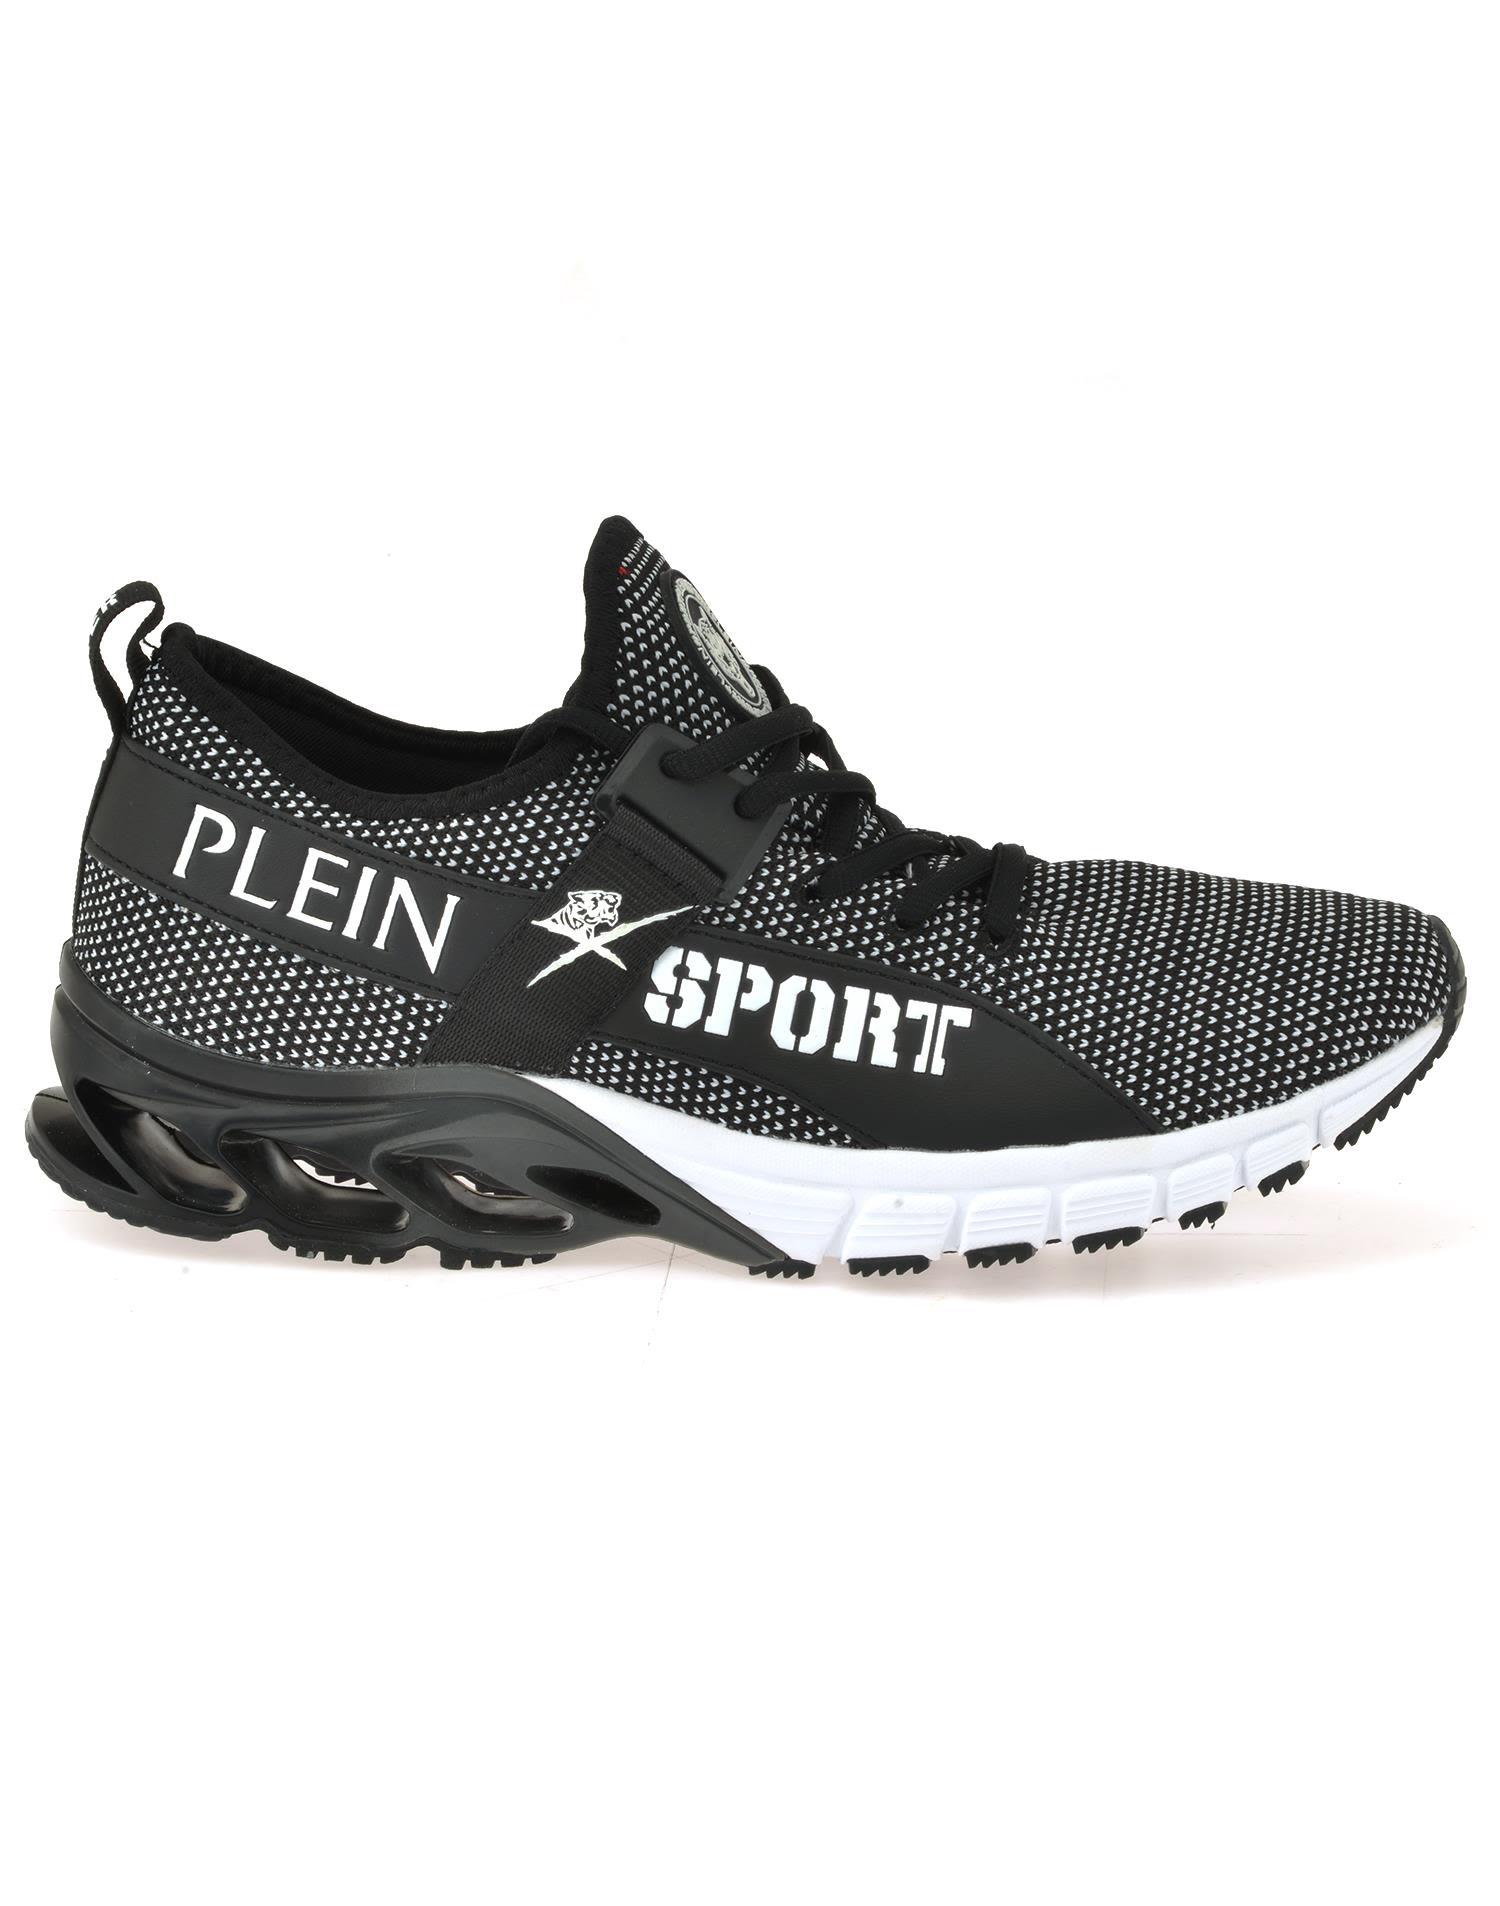 Philipp Plein Ultralight Sneaker